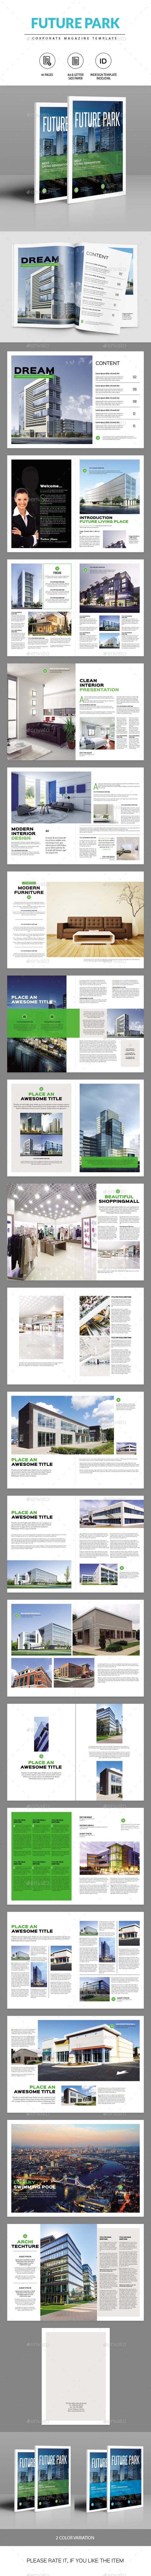 Architect Magazine Template-Future Park - Magazines Print Templates